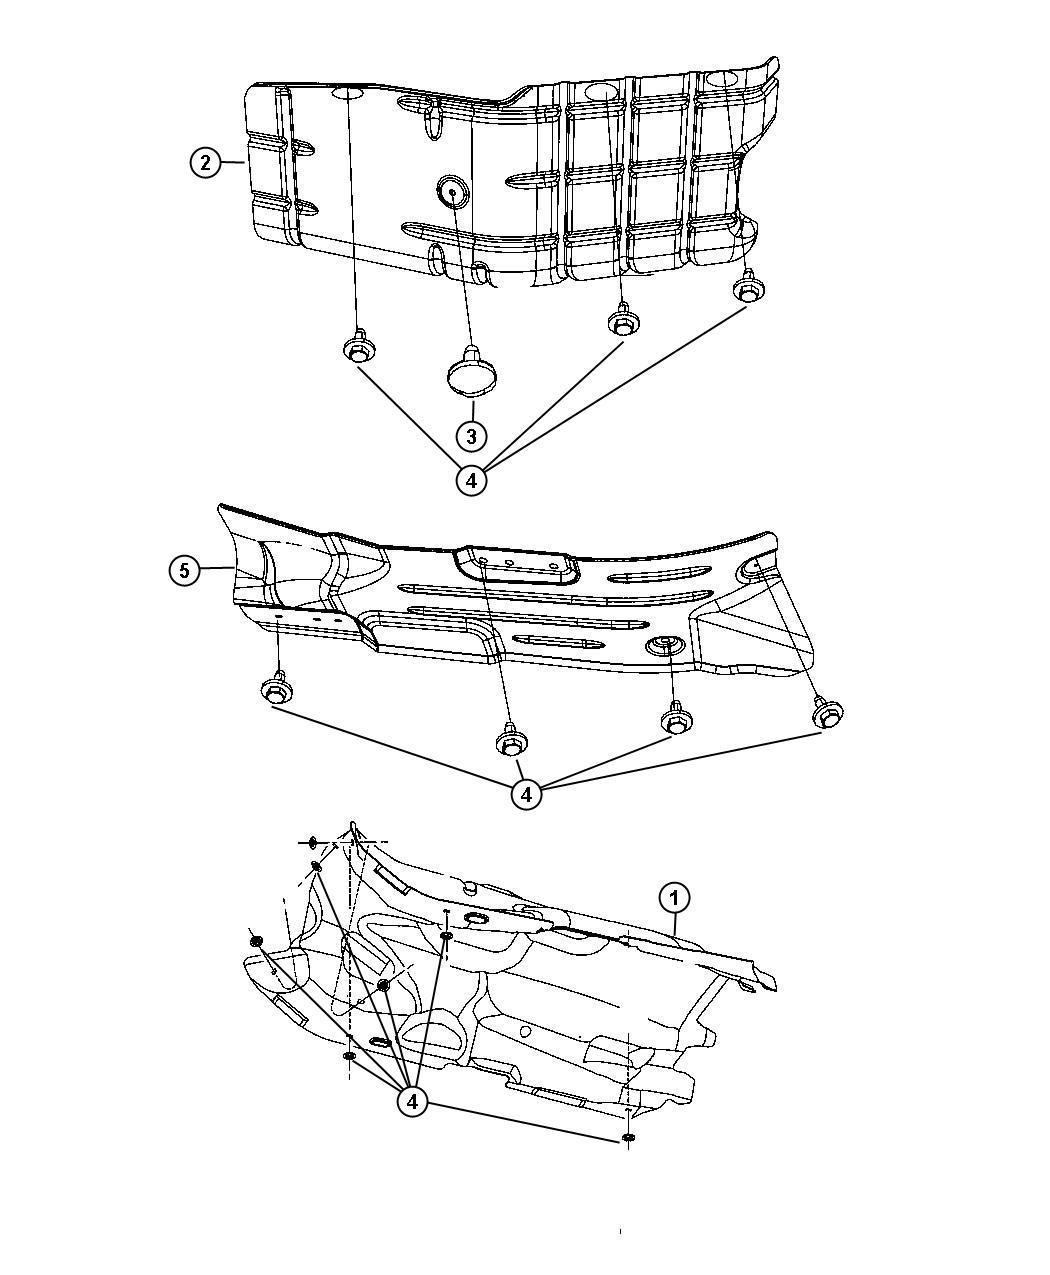 2012 Jeep Liberty Shield. Exhaust, floor pan. Muffler